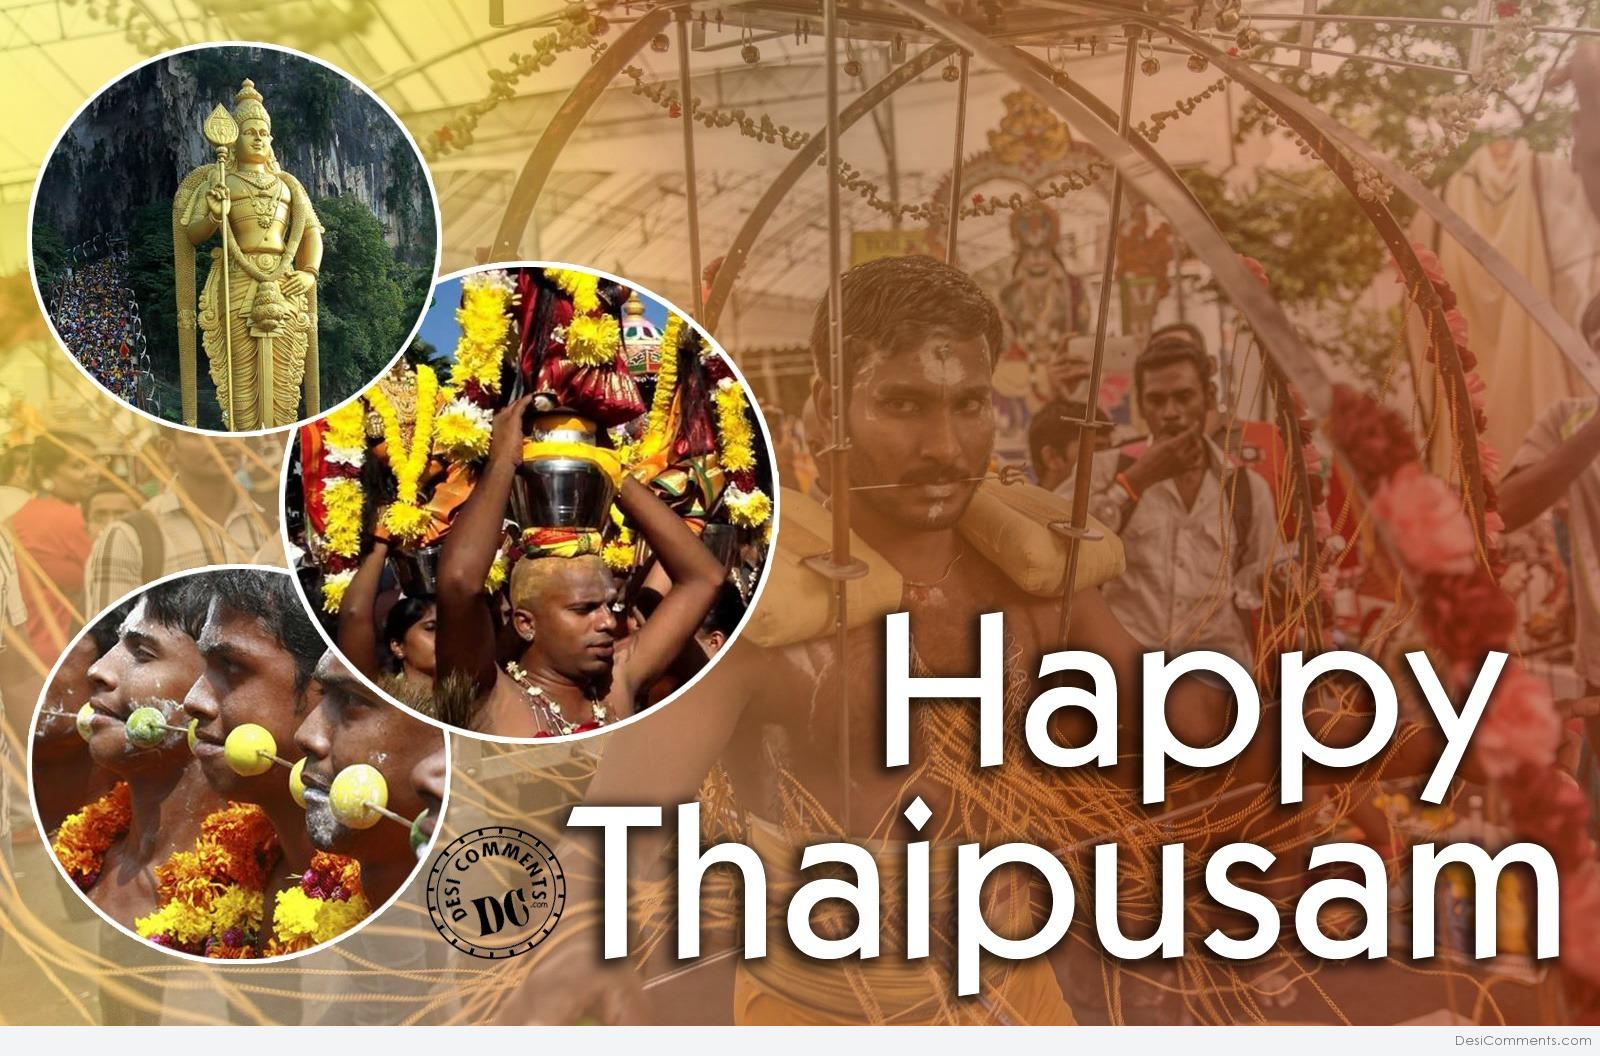 Off on 09/02/2017 Happy Thaipusam happy thaipusam